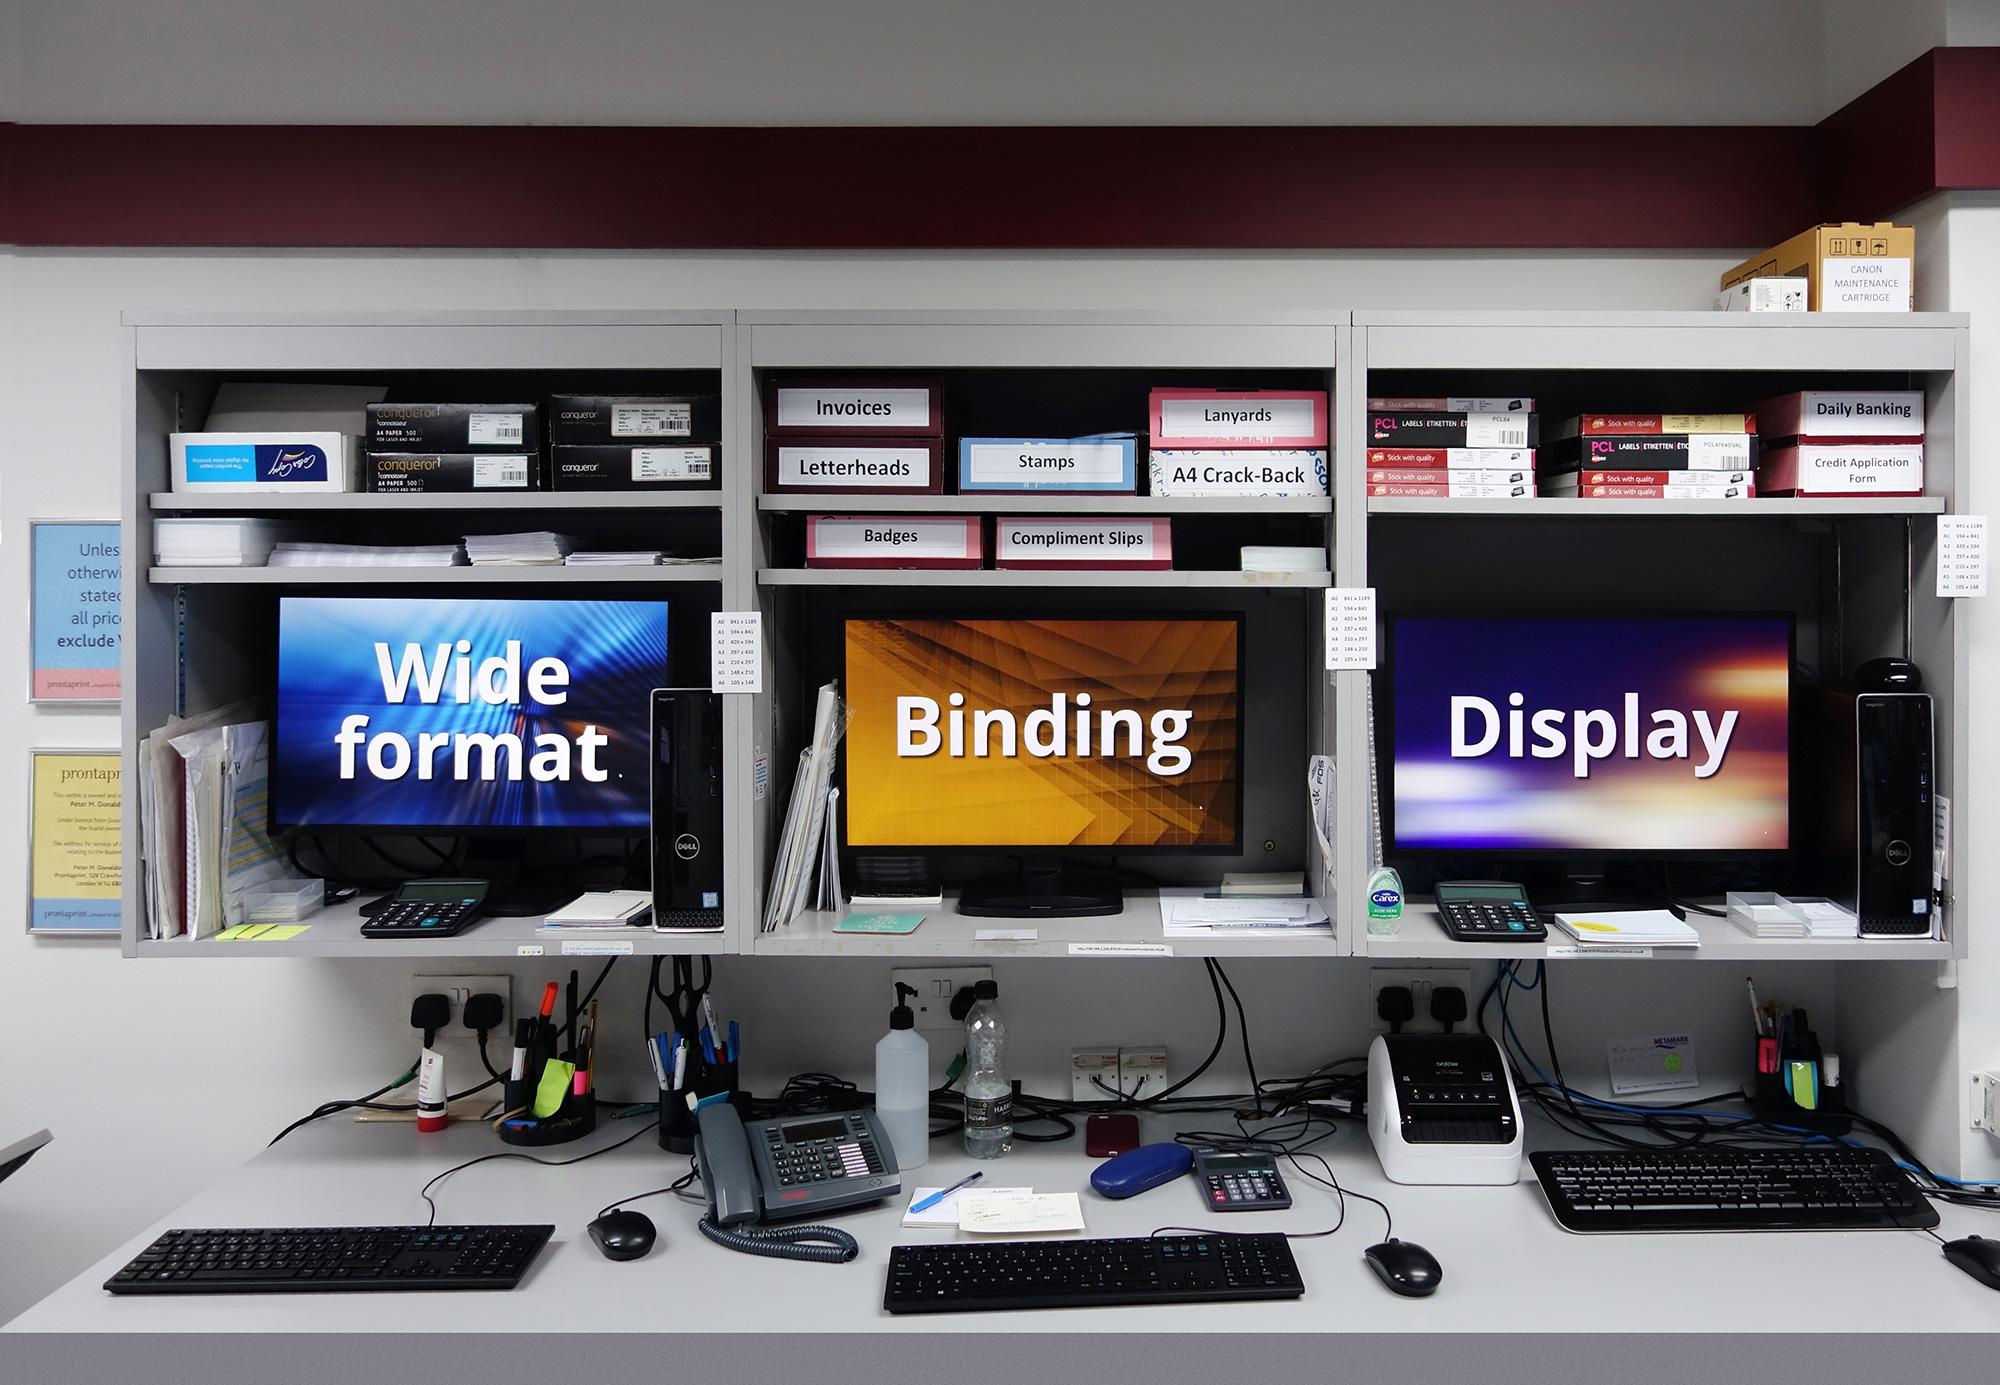 2-wide-format-binding-display